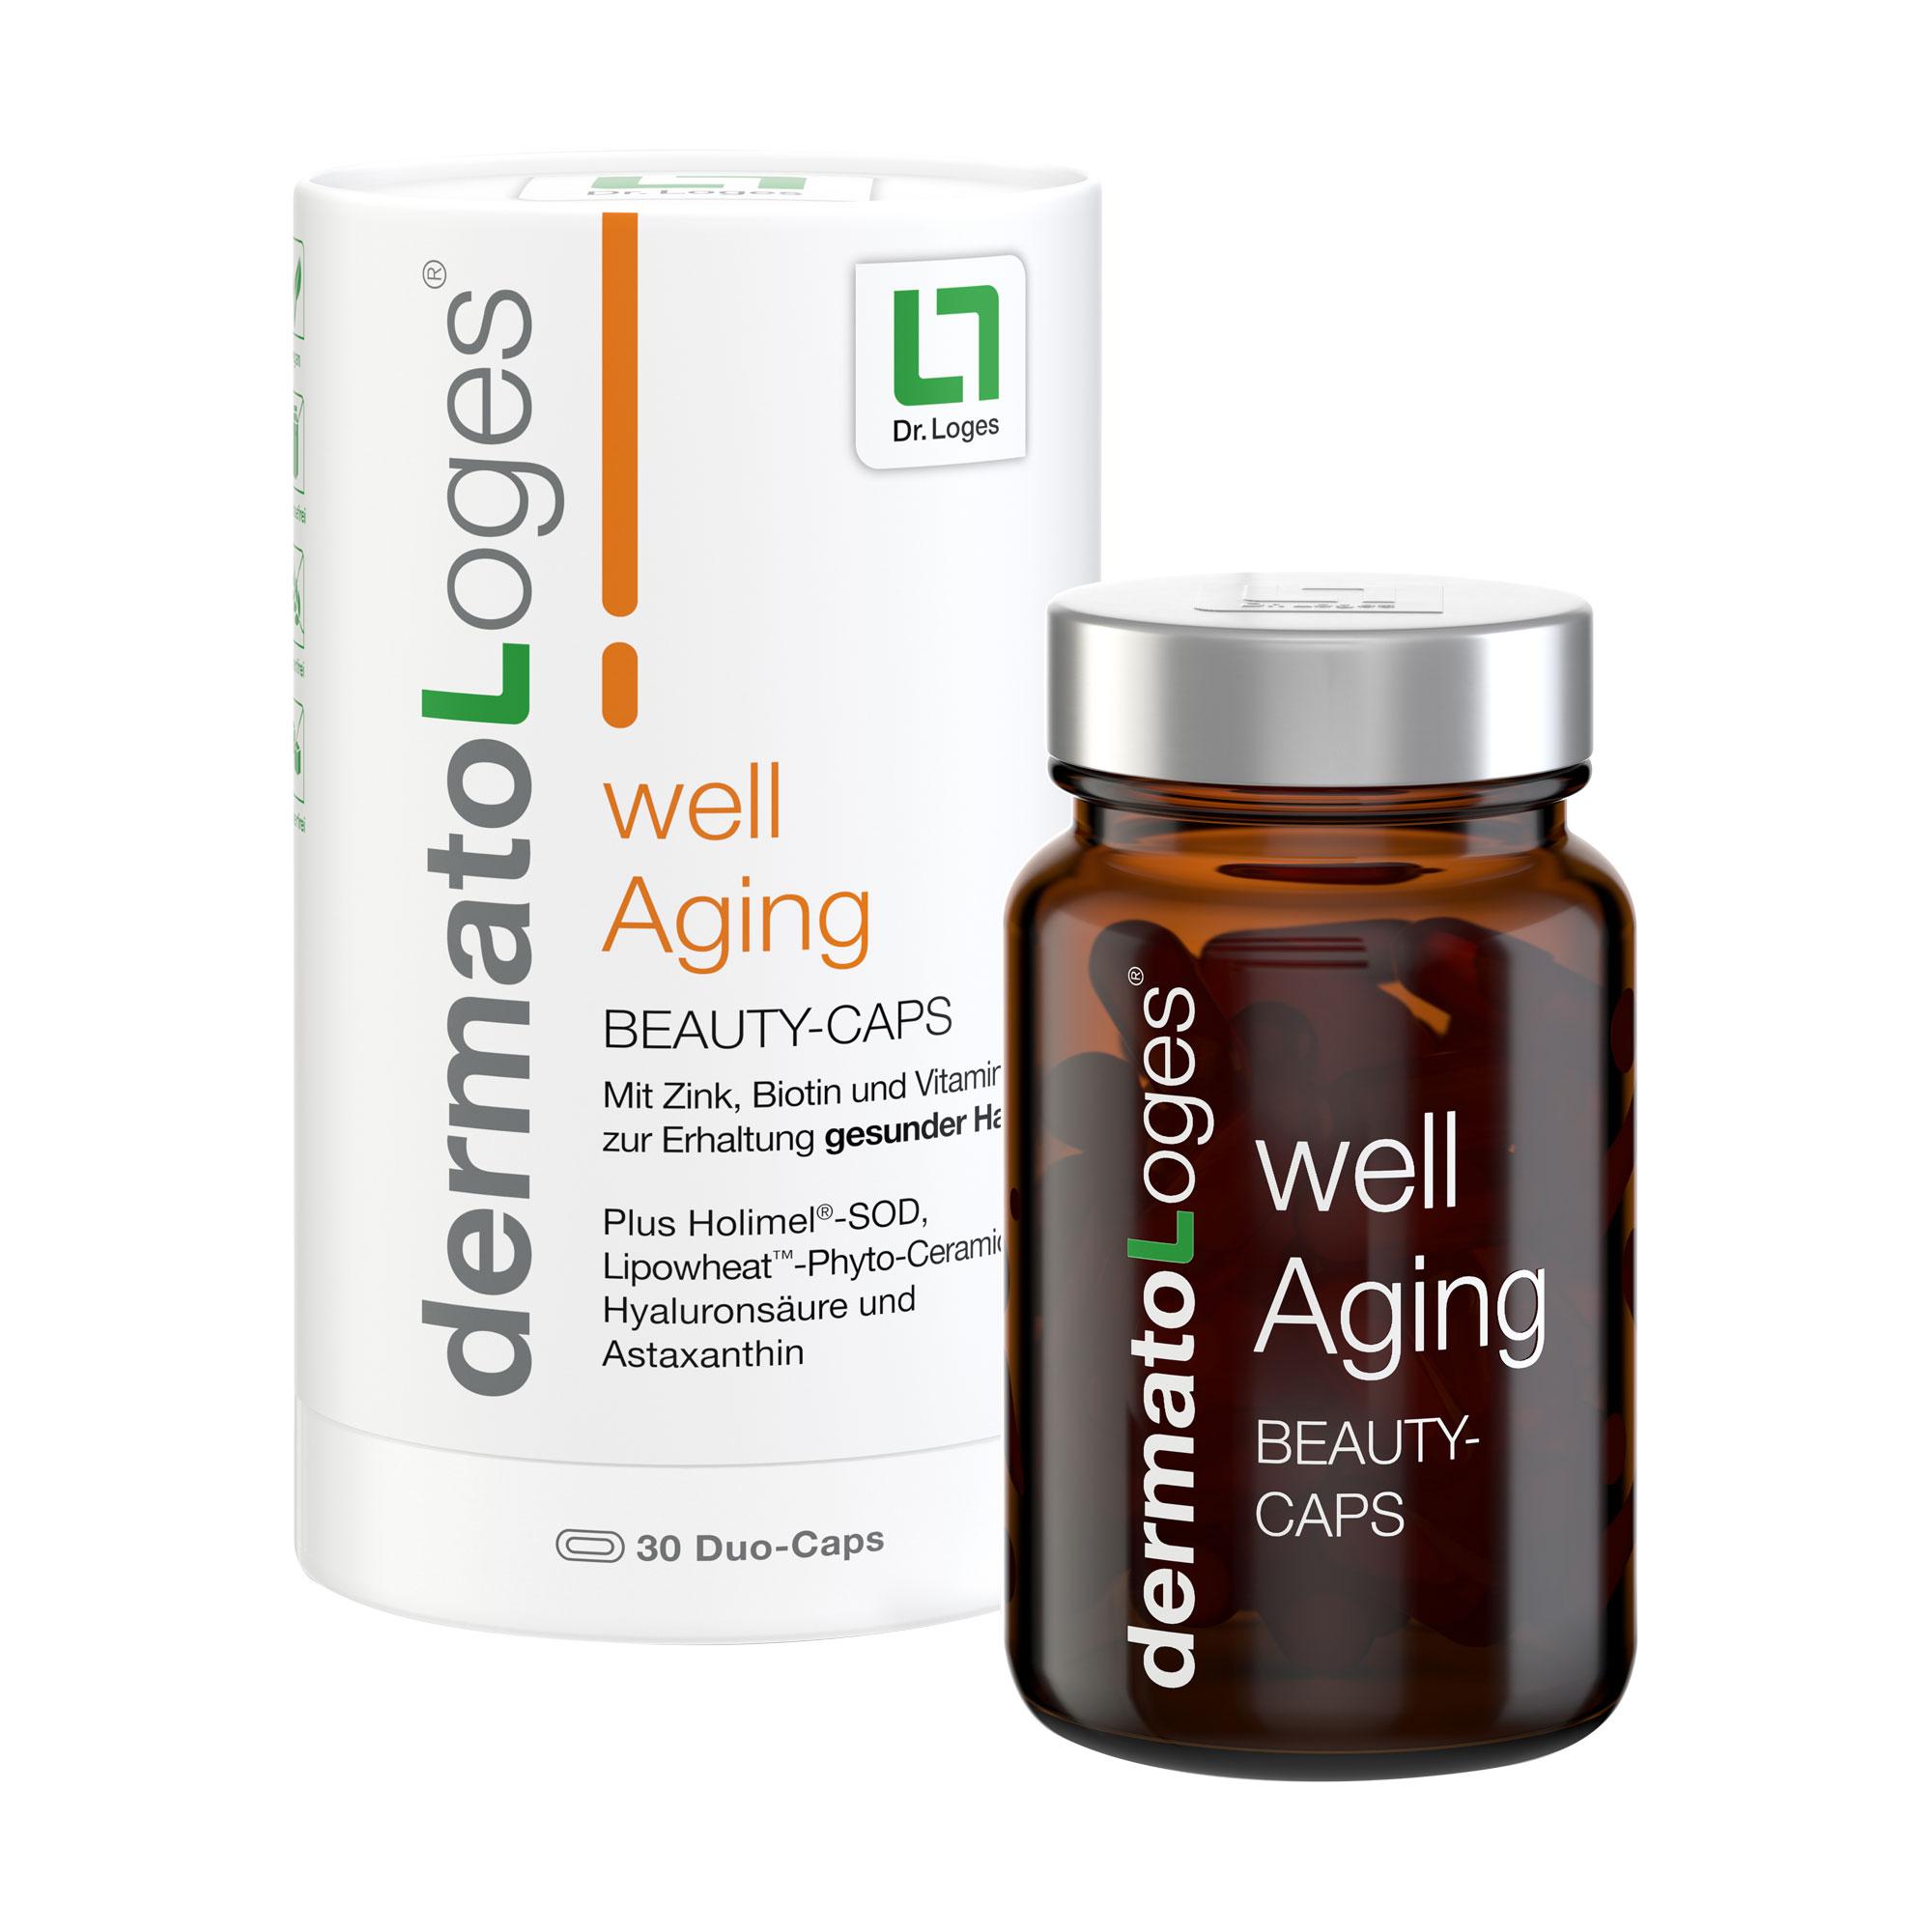 DermatoLoges wellAging